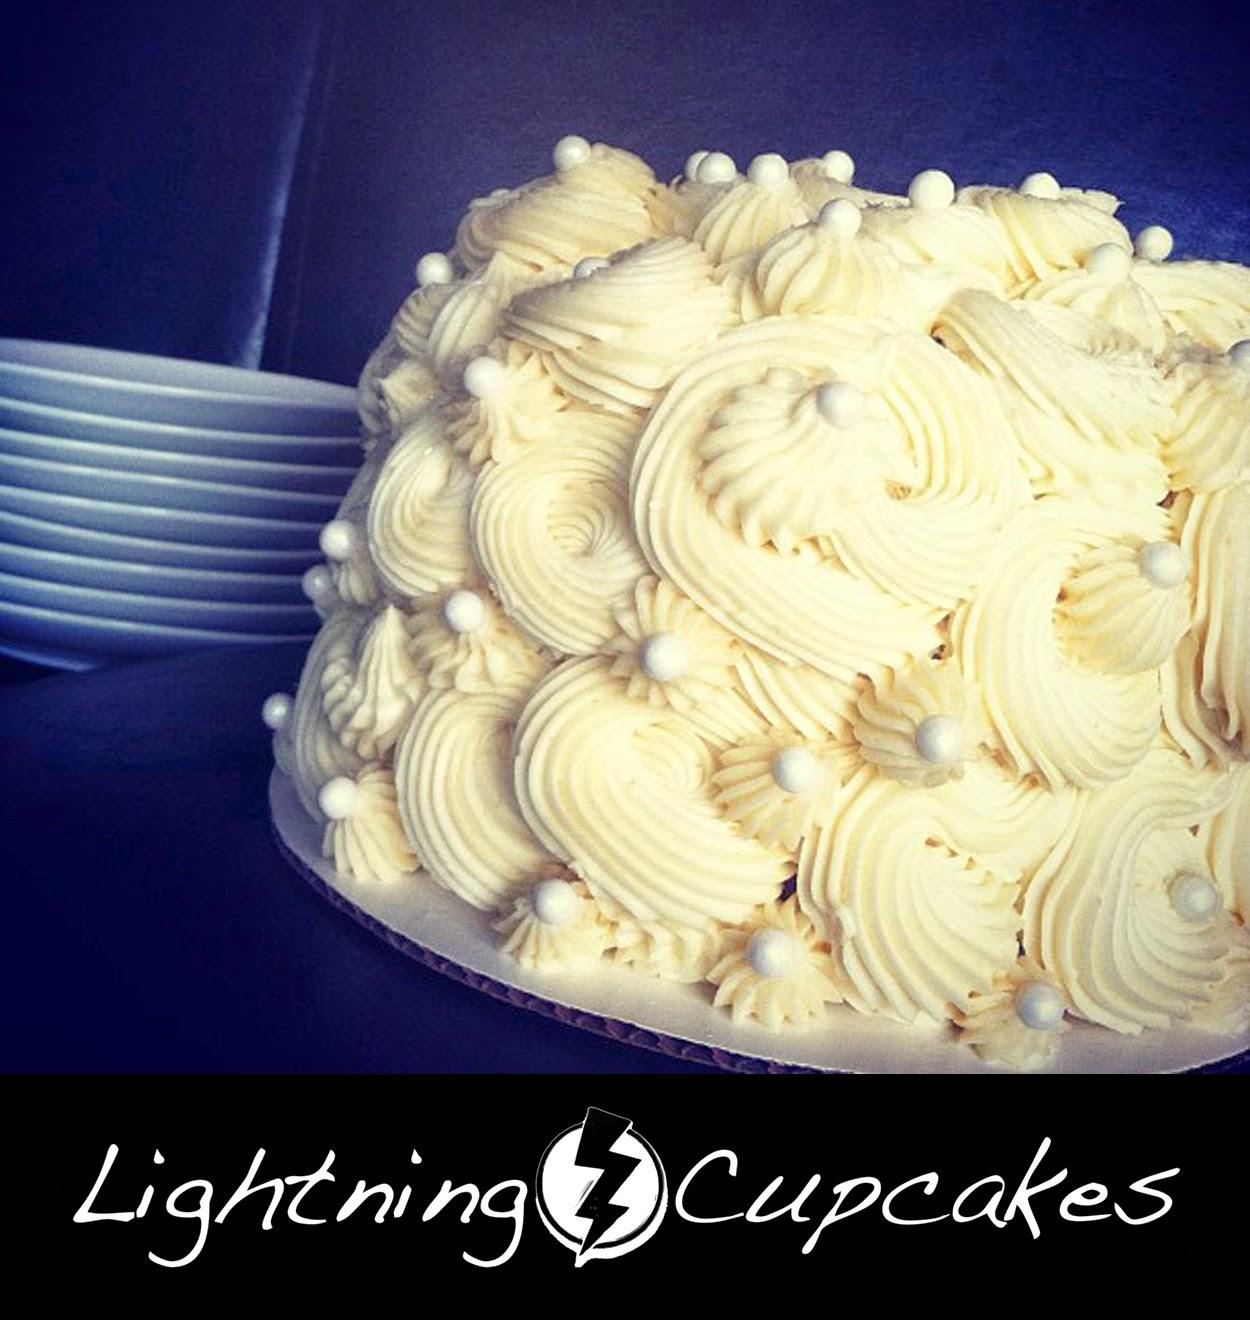 Lightning Cupcakes: Weddings / Events